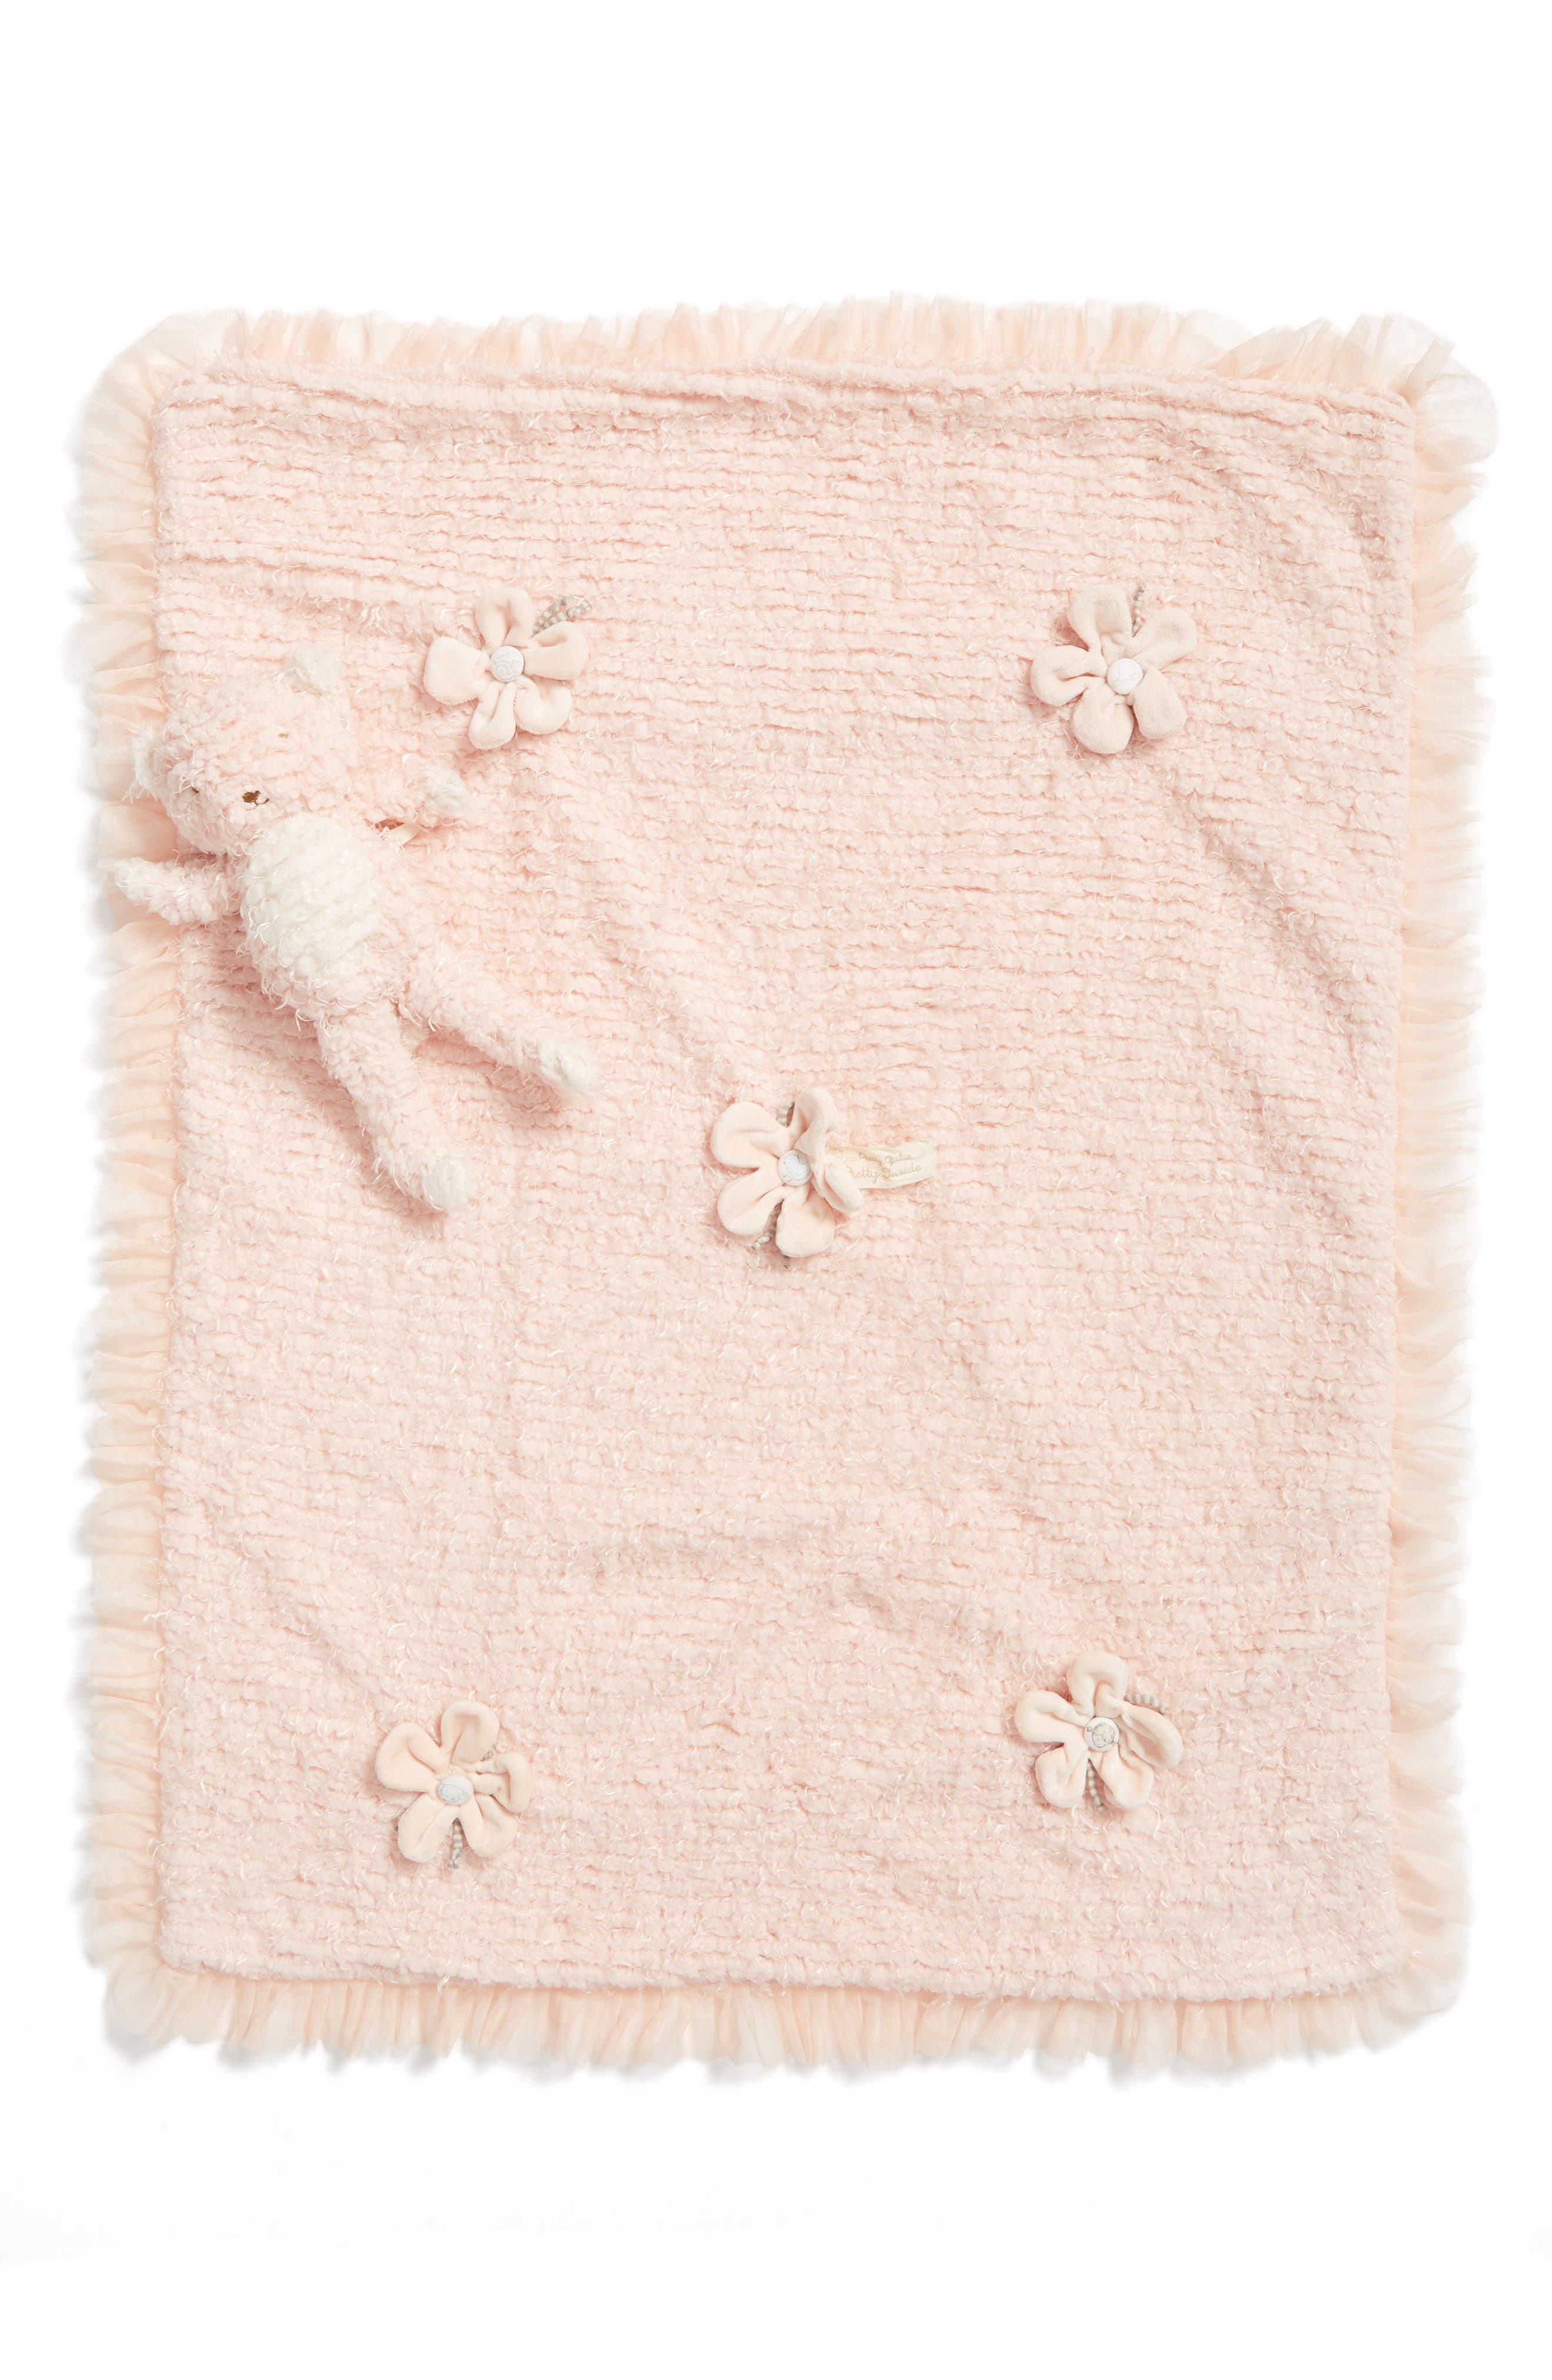 BUNNIES BY THE BAY Shaggy Blanket & Stuffed